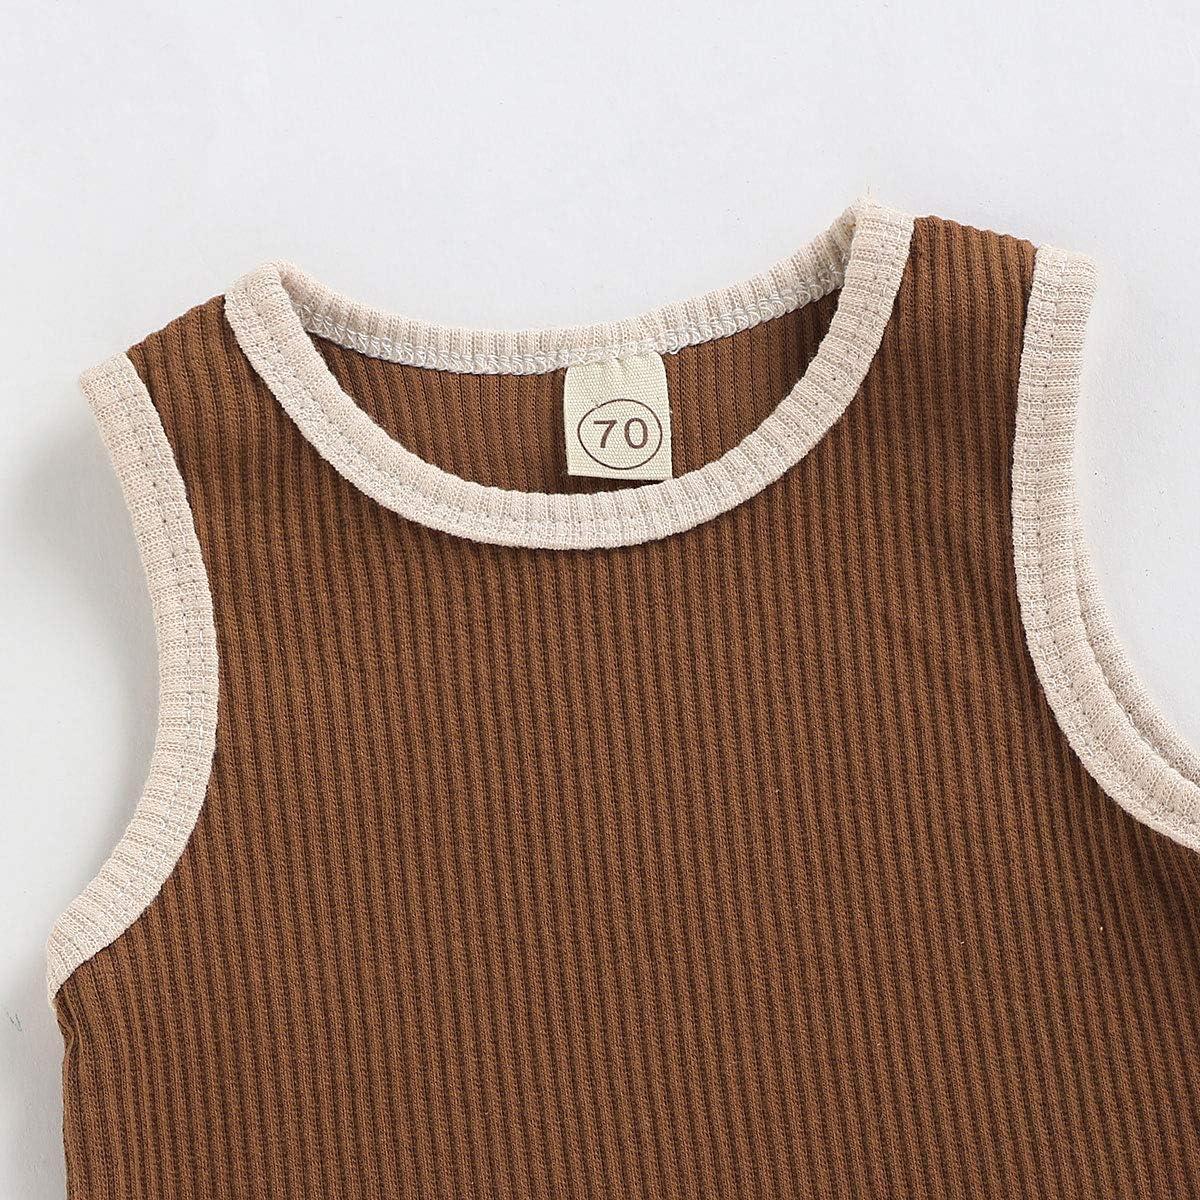 Aweyoo Newborn Baby Boy Girl Jumpsuit Cotton Solid Stripe Sleeveless Romper One-Piece Bodysuit Clothes Outfits 61UztygA38L